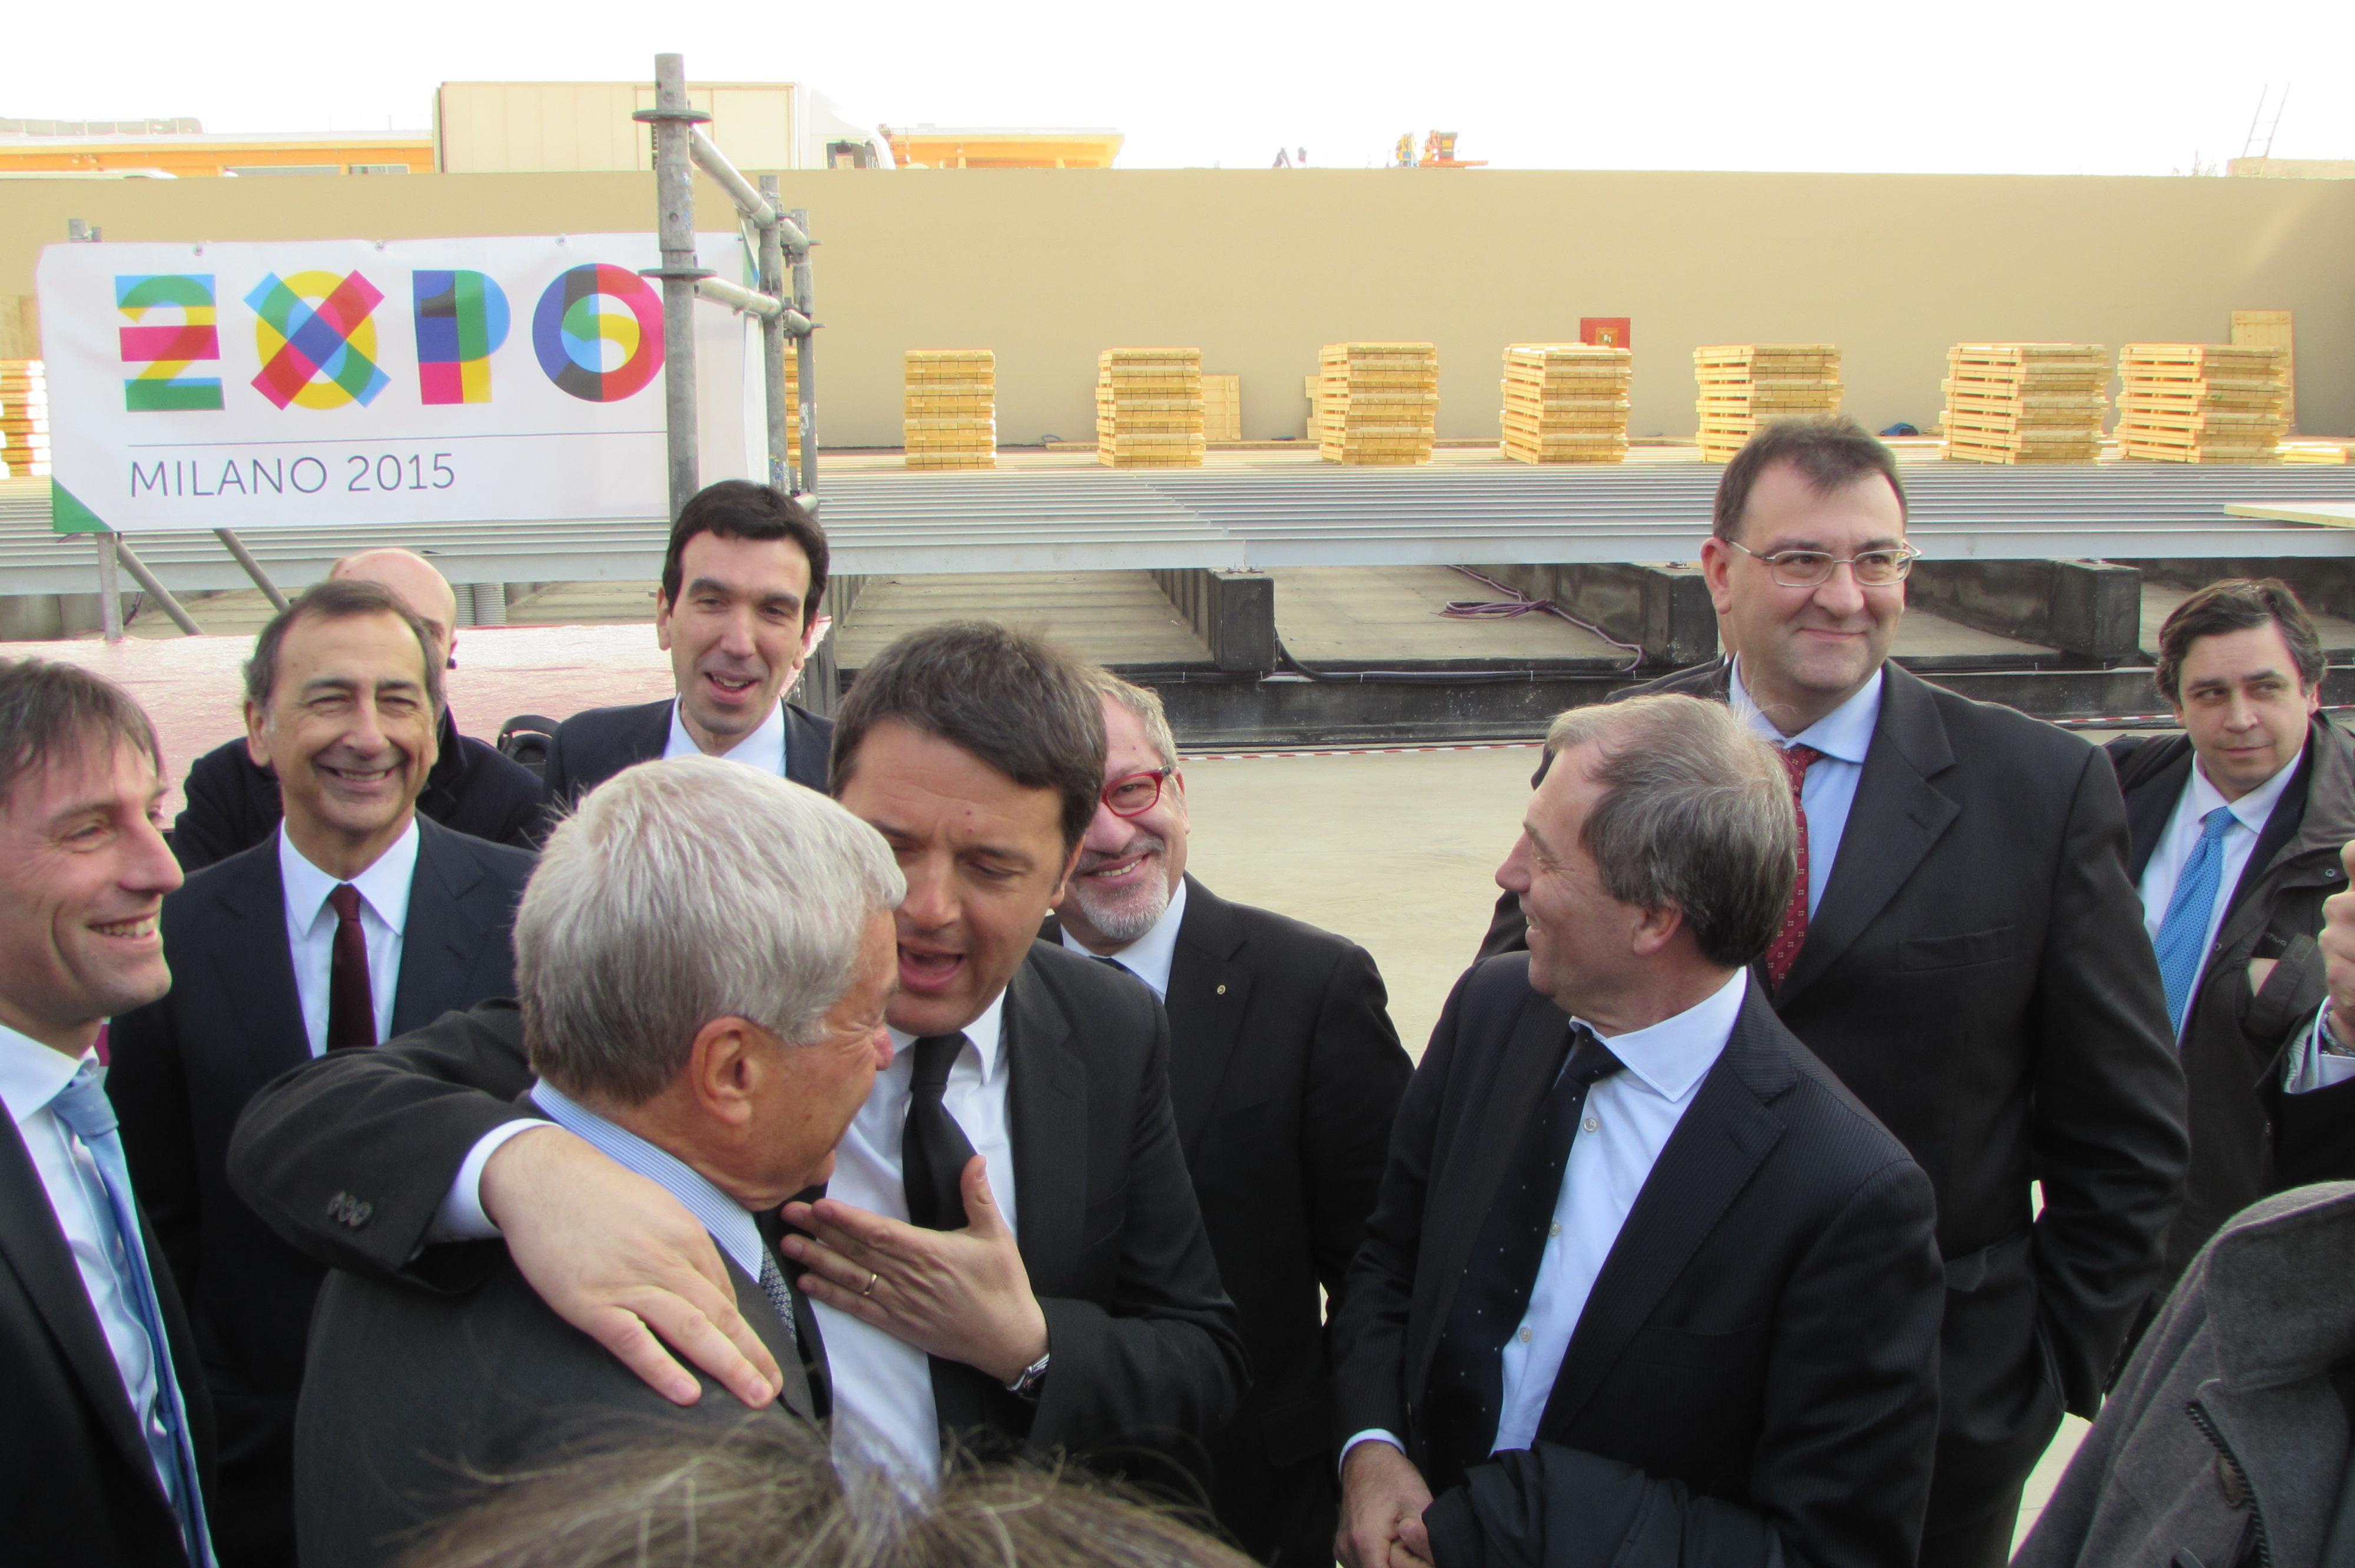 Matteo Renzi al cantiere Expo 2015